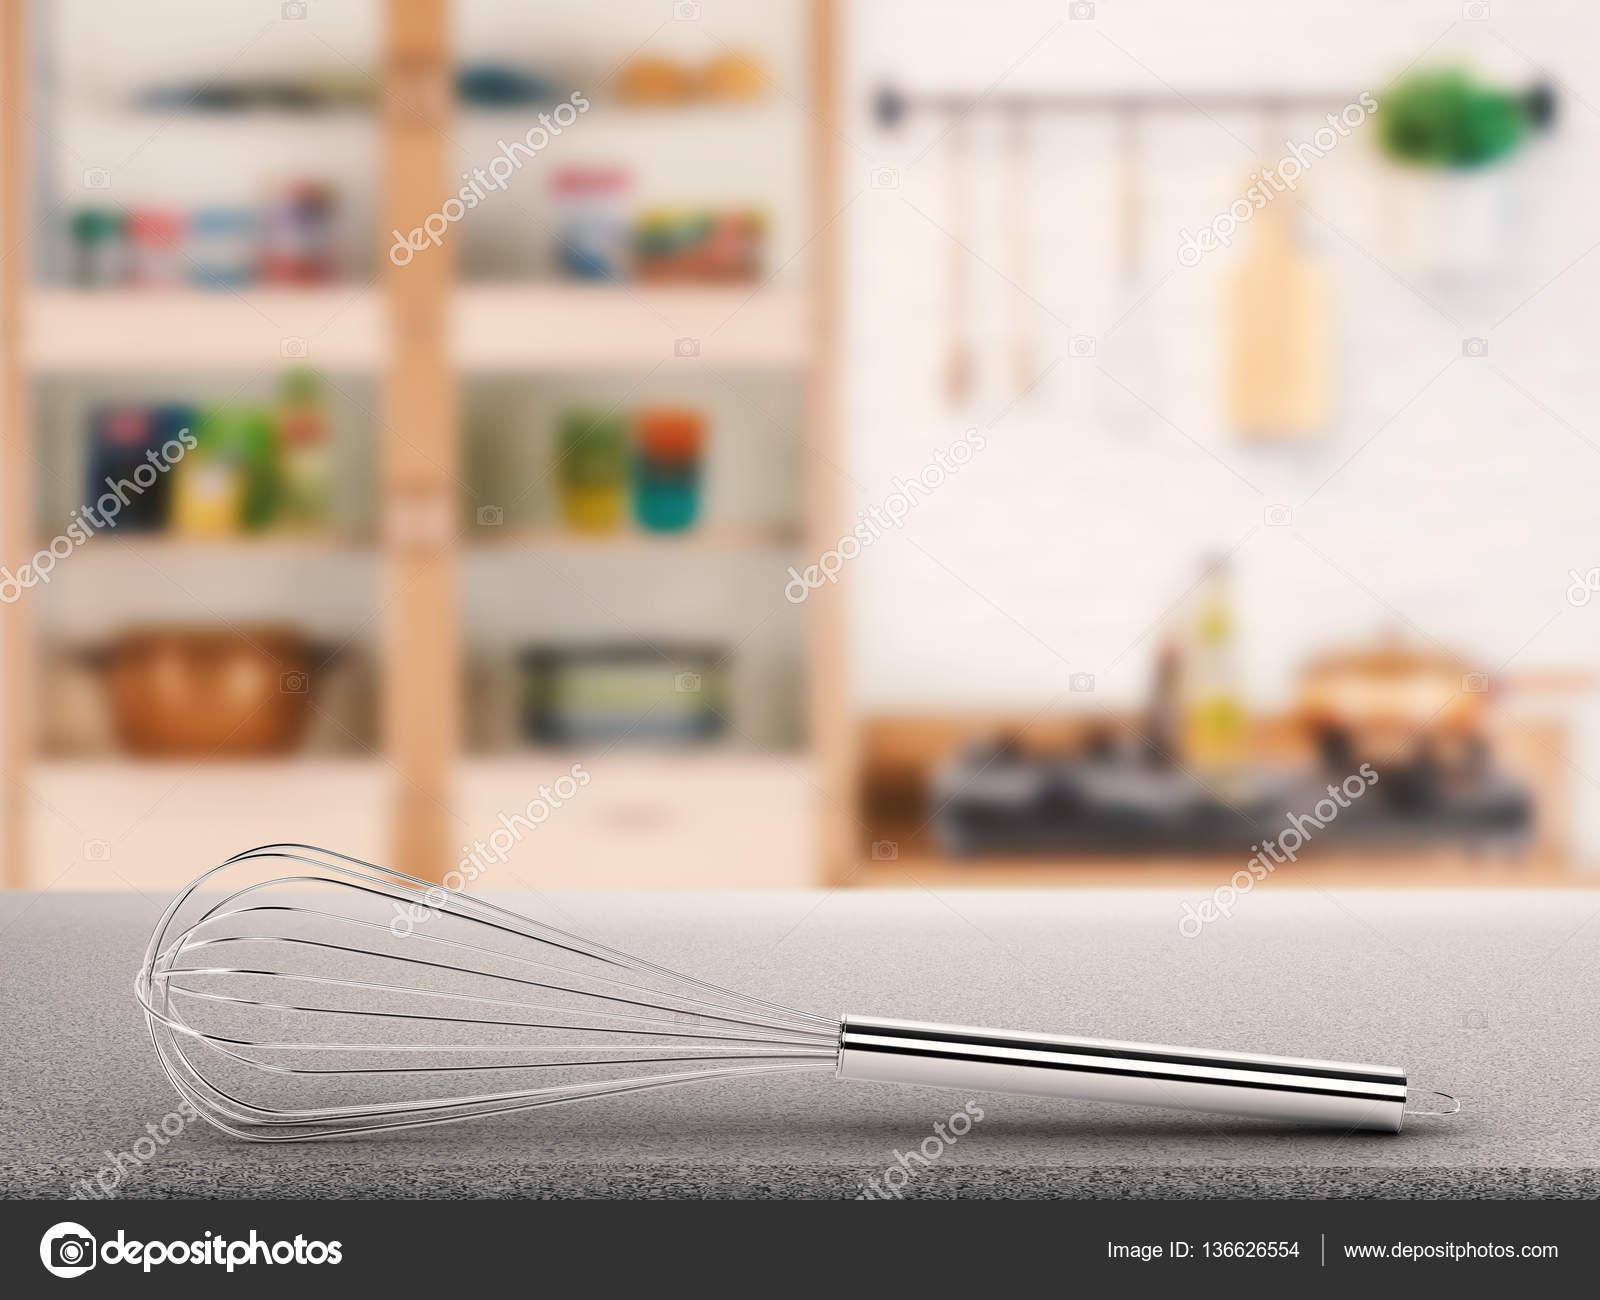 kitchen whisk outdoor vent hood 与厨房背景柜台上钢丝拂尘 图库照片 c phonlamai 136626554 3d 渲染钢丝拂尘在柜台与厨房背景上 照片作者phonlamai